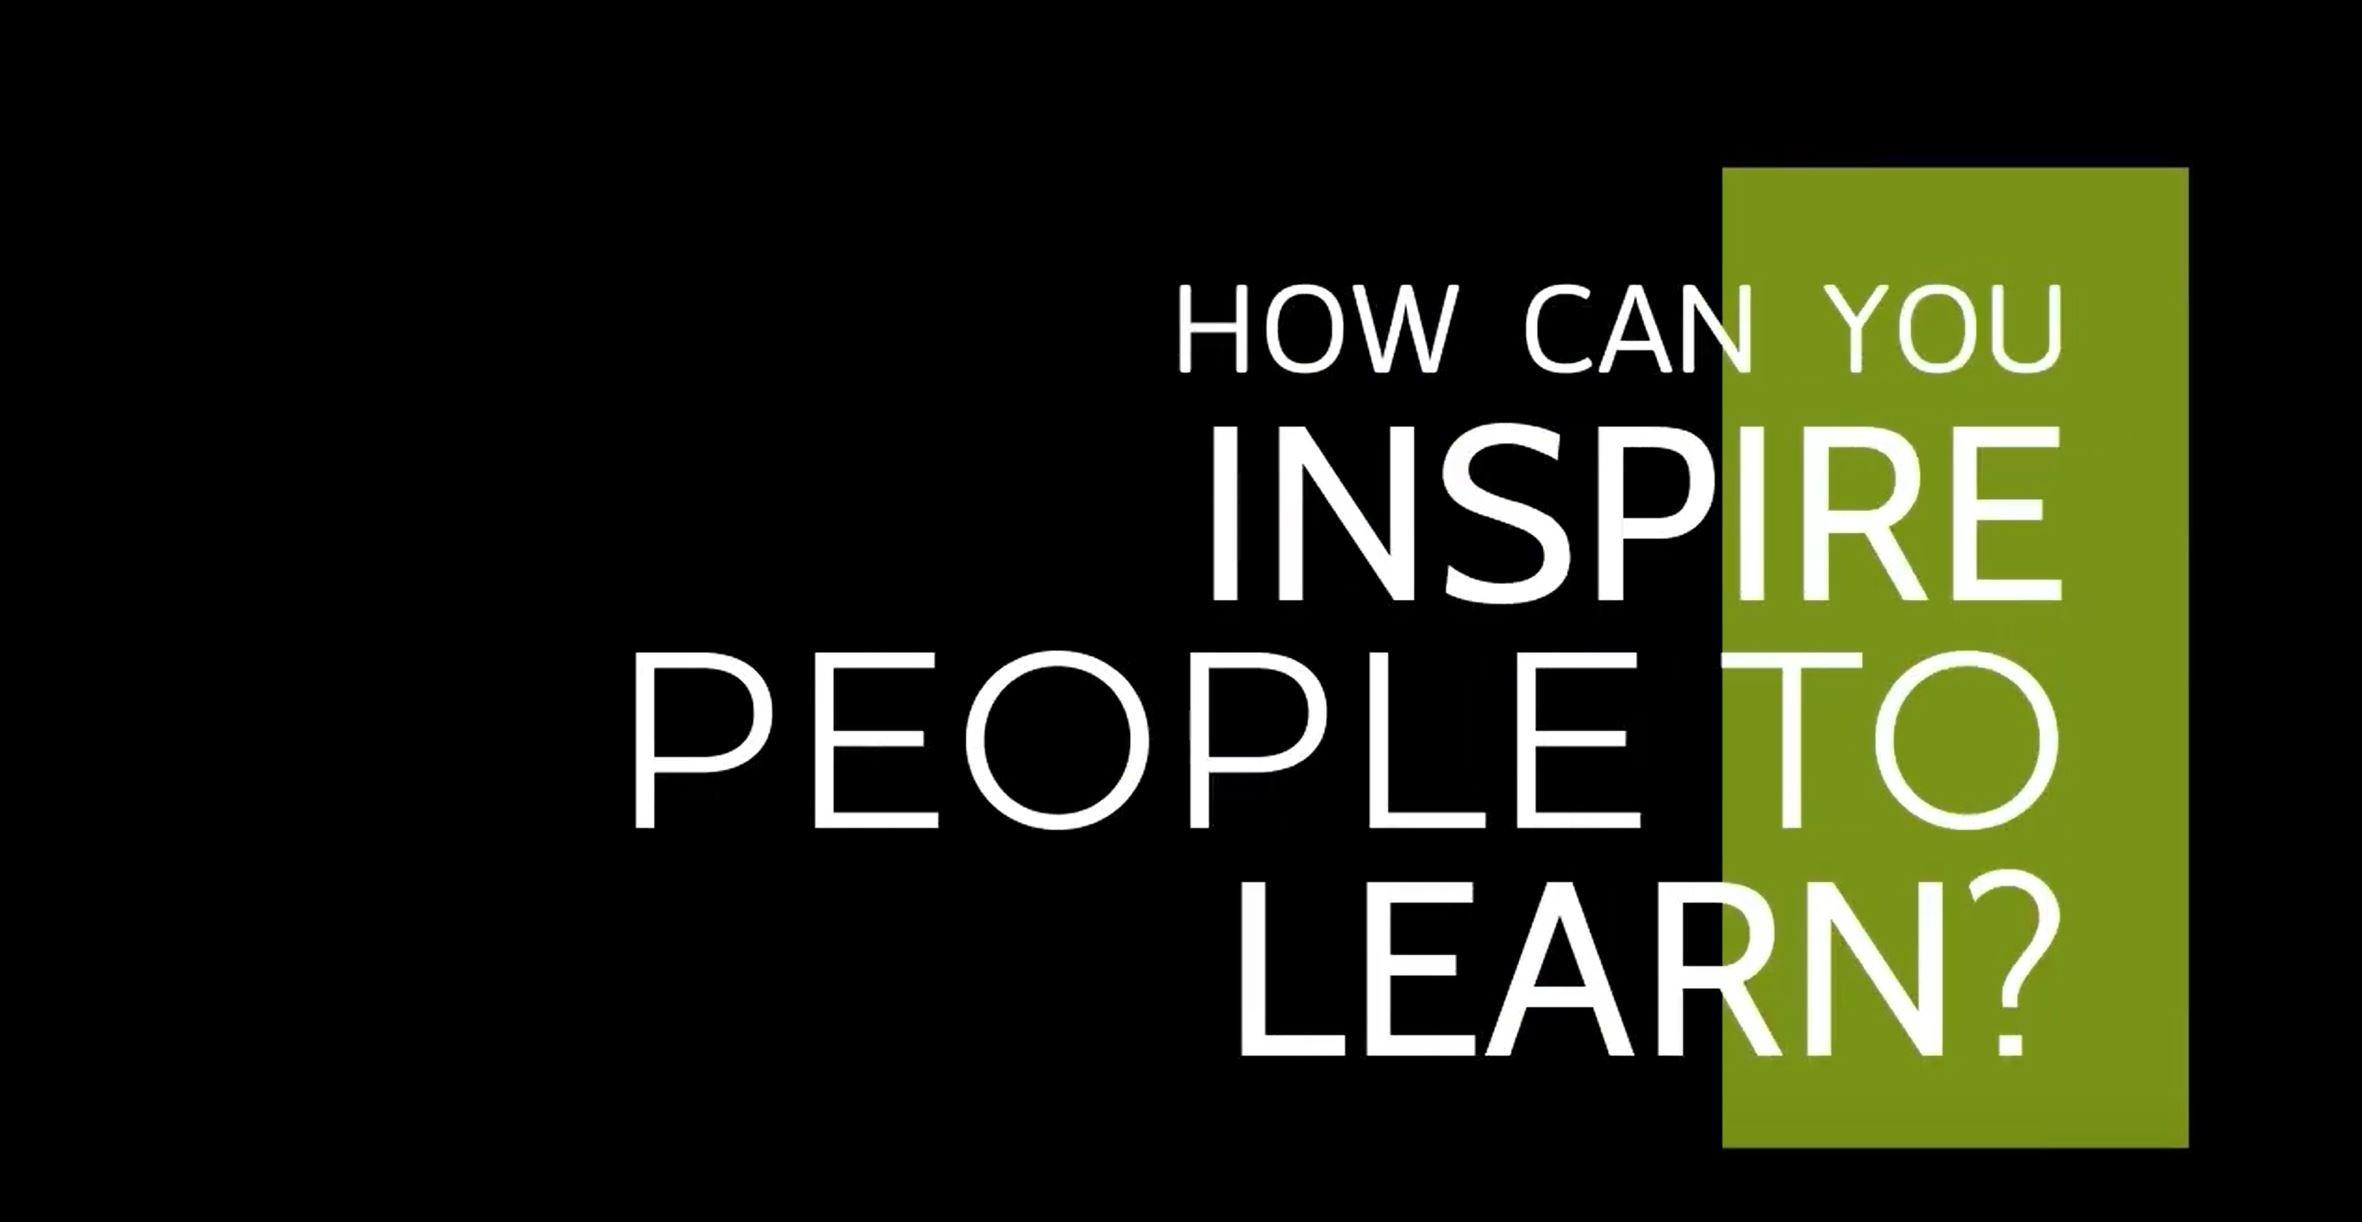 WSCLF Teacher Inspiring to learn